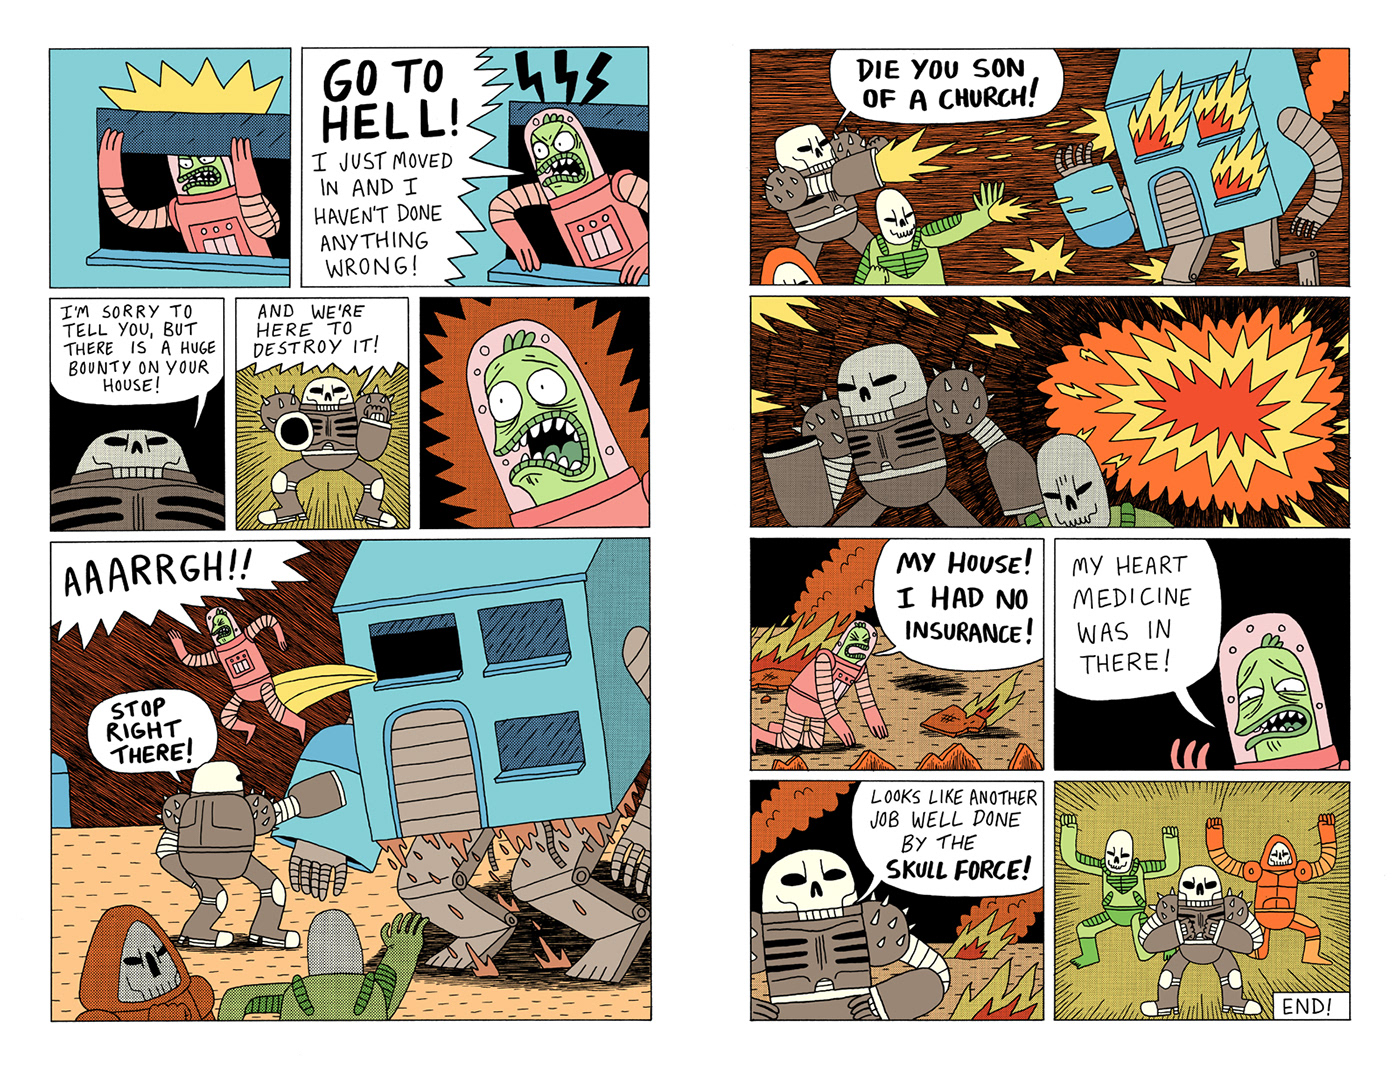 the wrong house comic